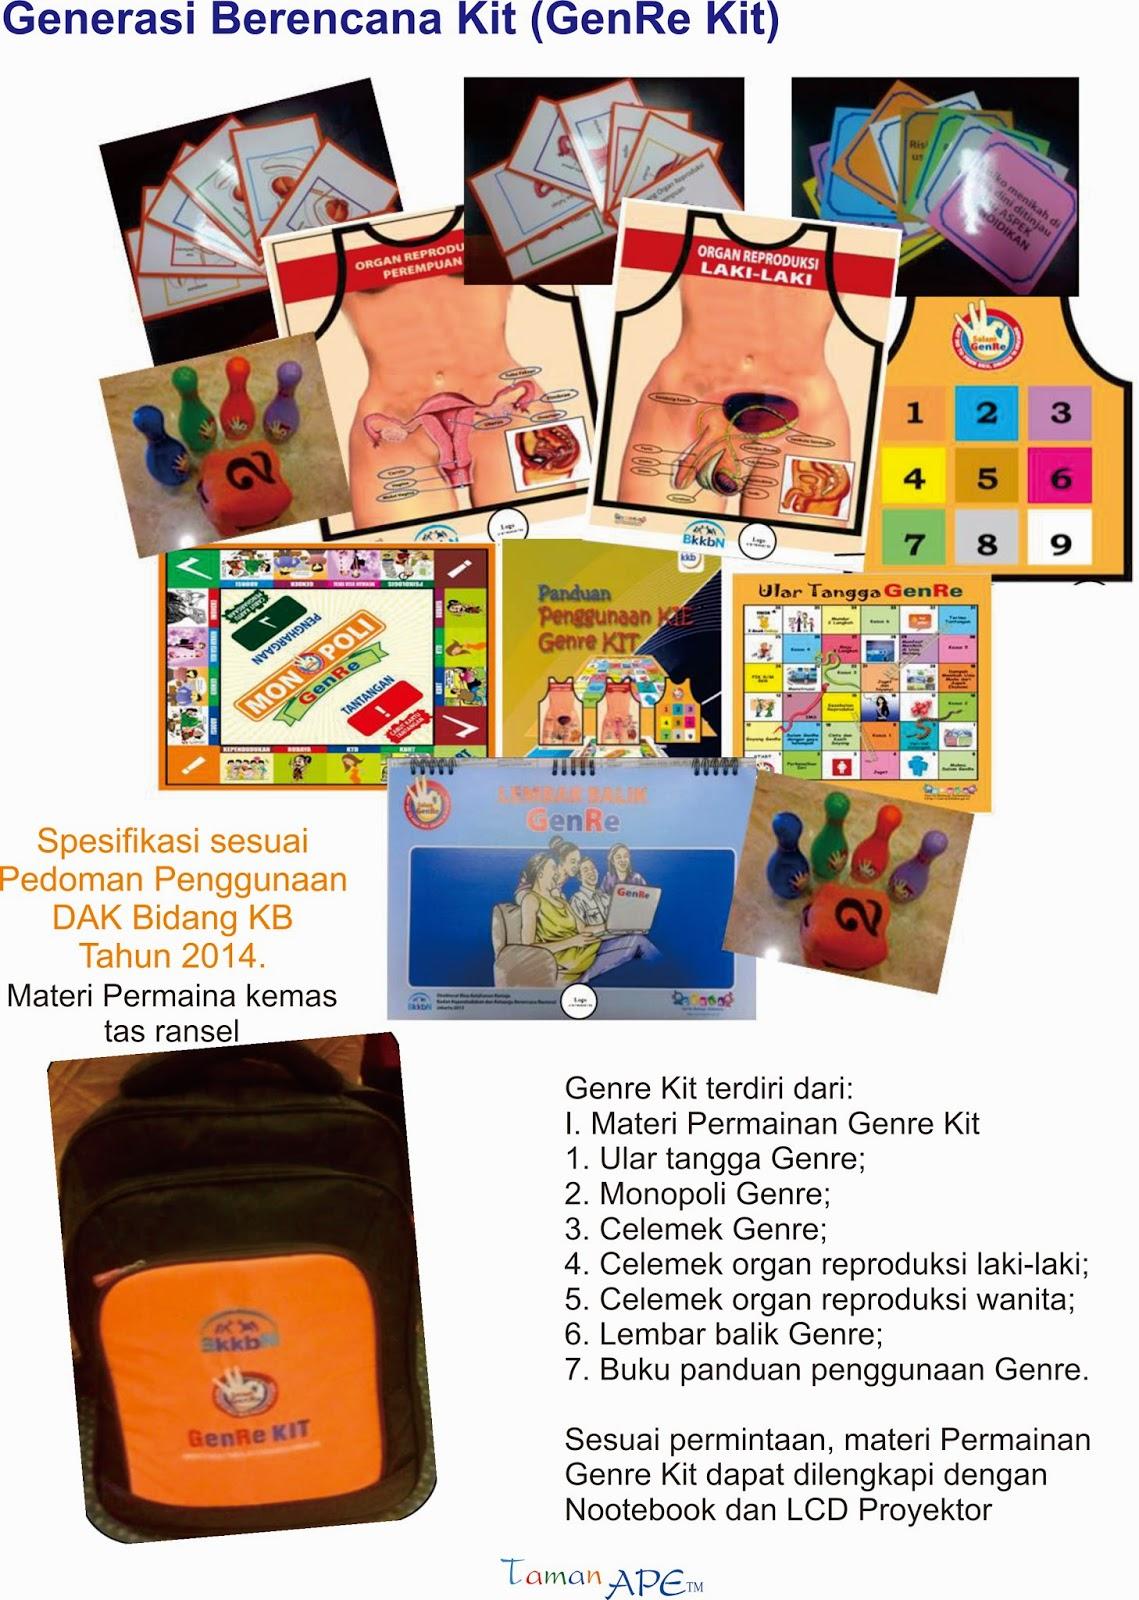 Lelang Genre KIT 2015 ~ Tender GENRE KIT BKKbN 2015 ~   Pengadaan genre Kit 2015